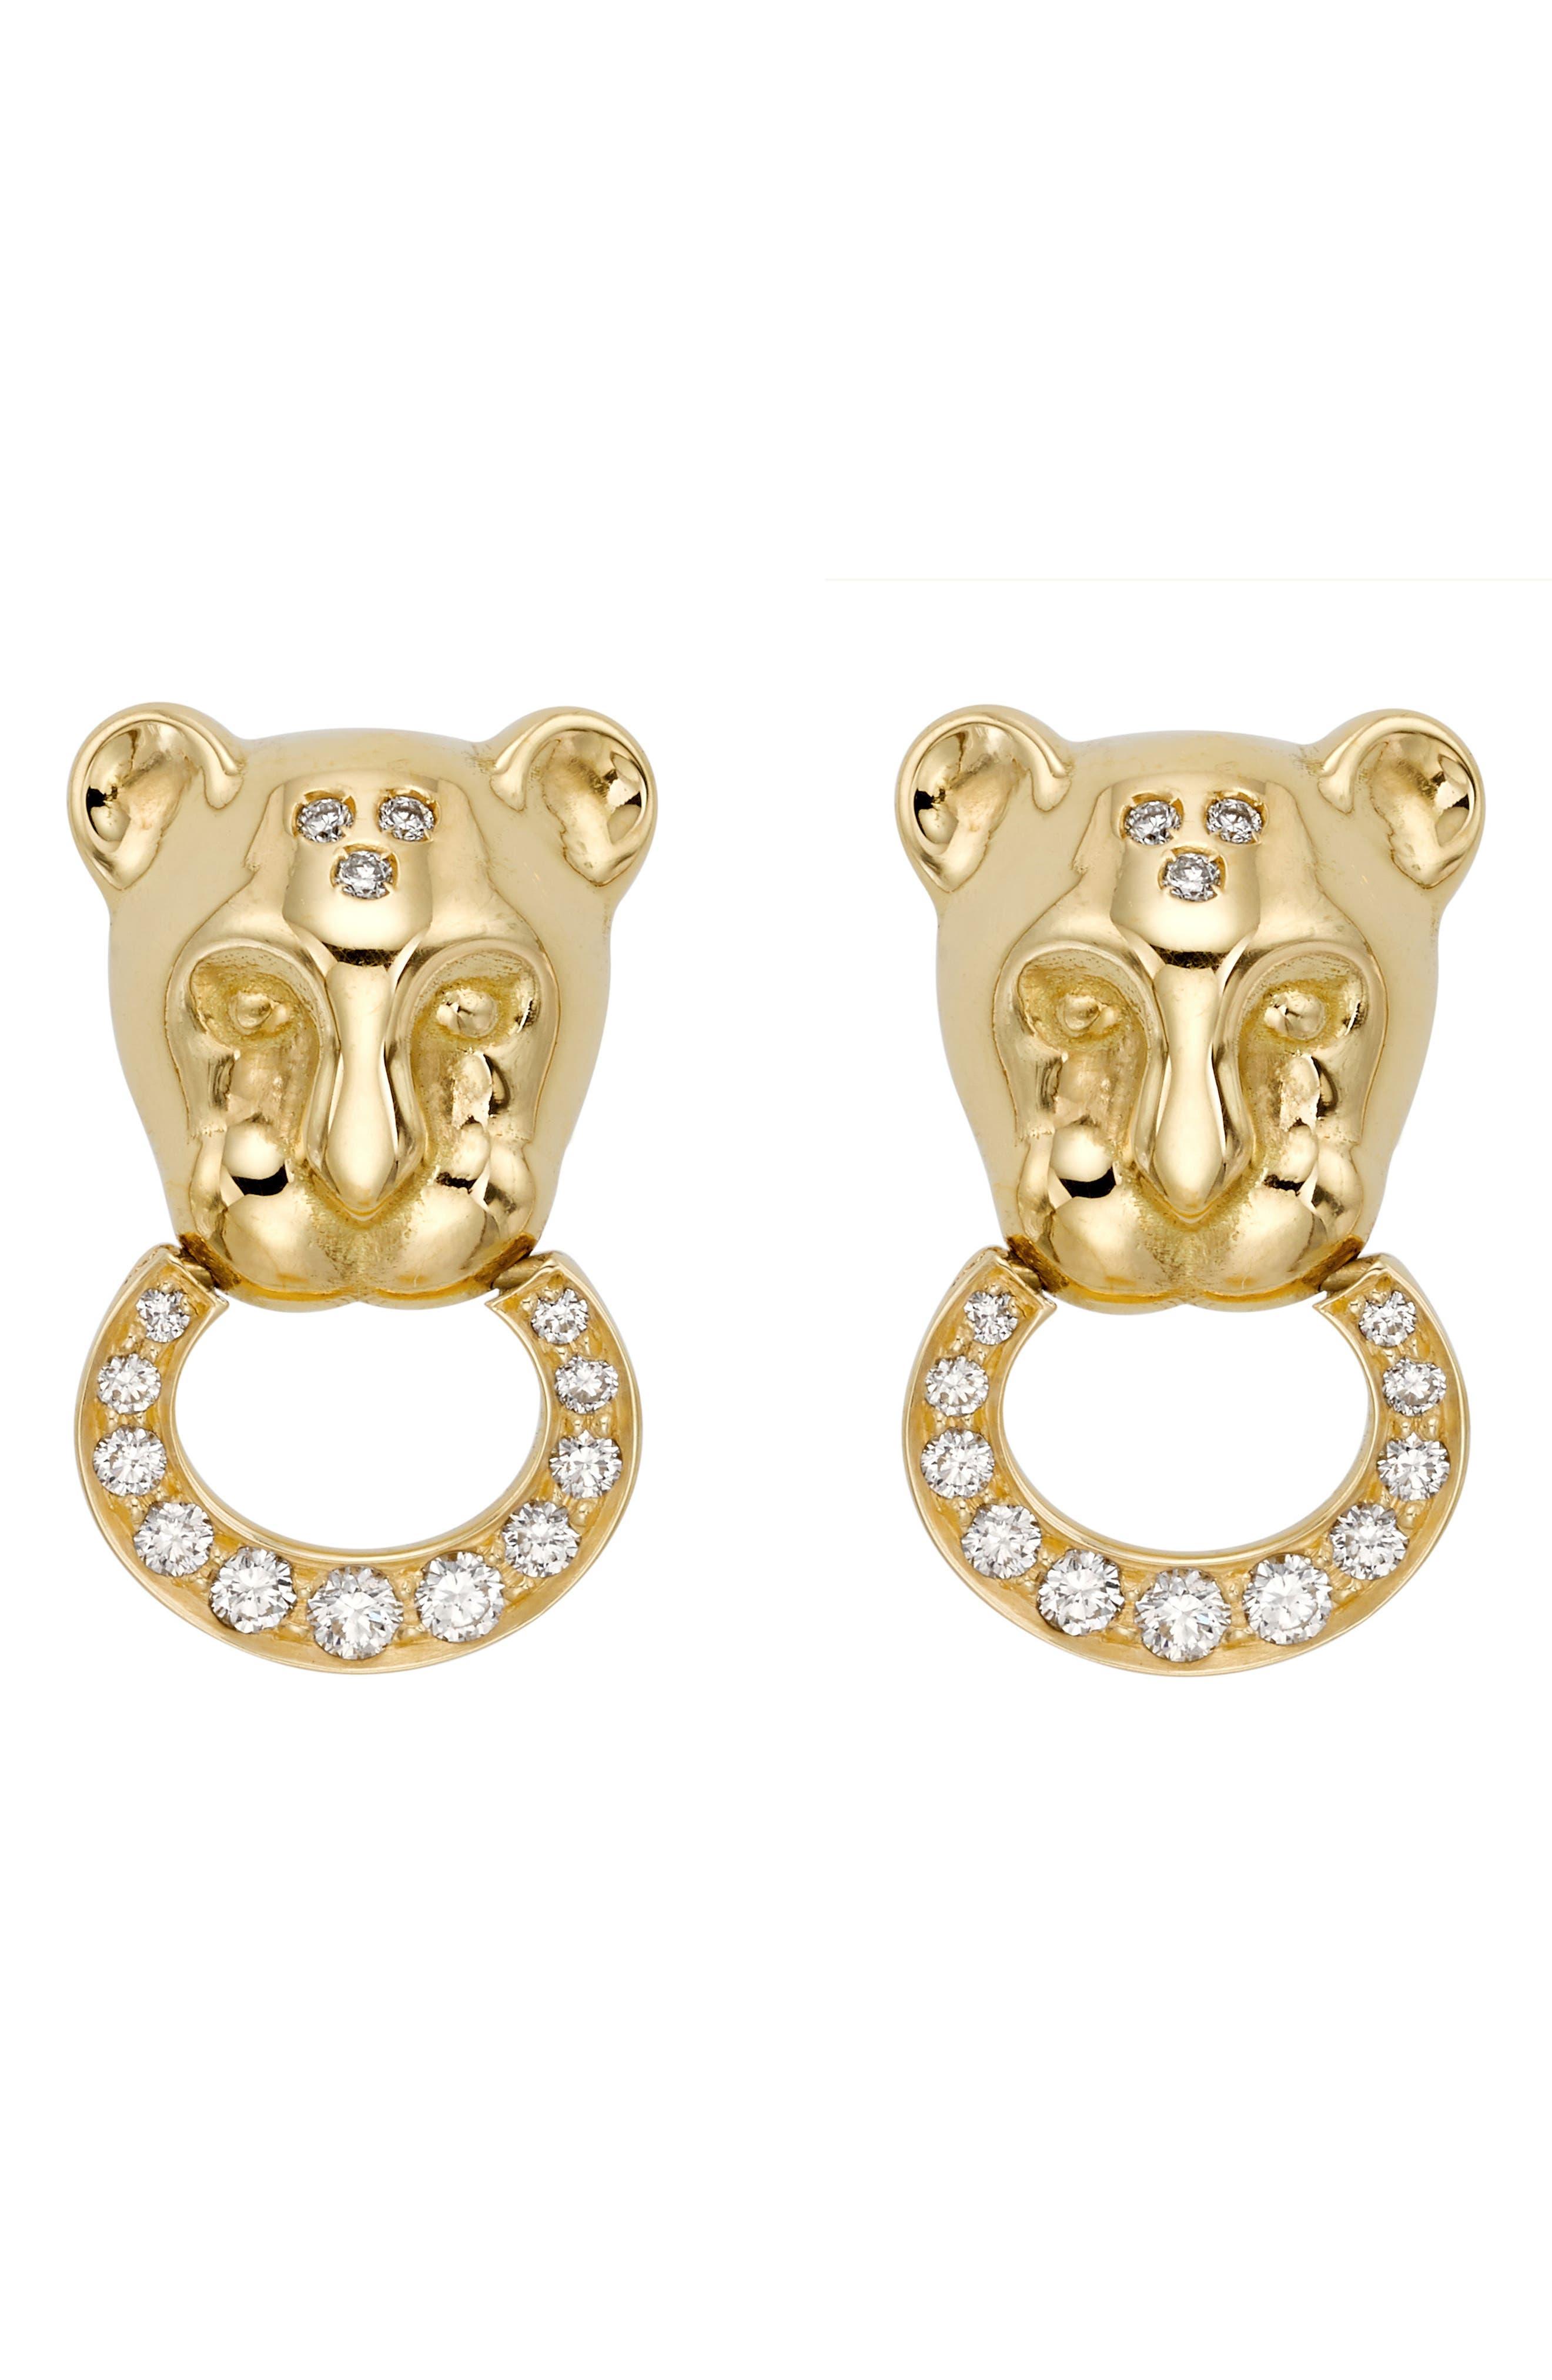 Alternate Image 1 Selected - Temple St. Clair Lion Cub Diamond Stud Earrings